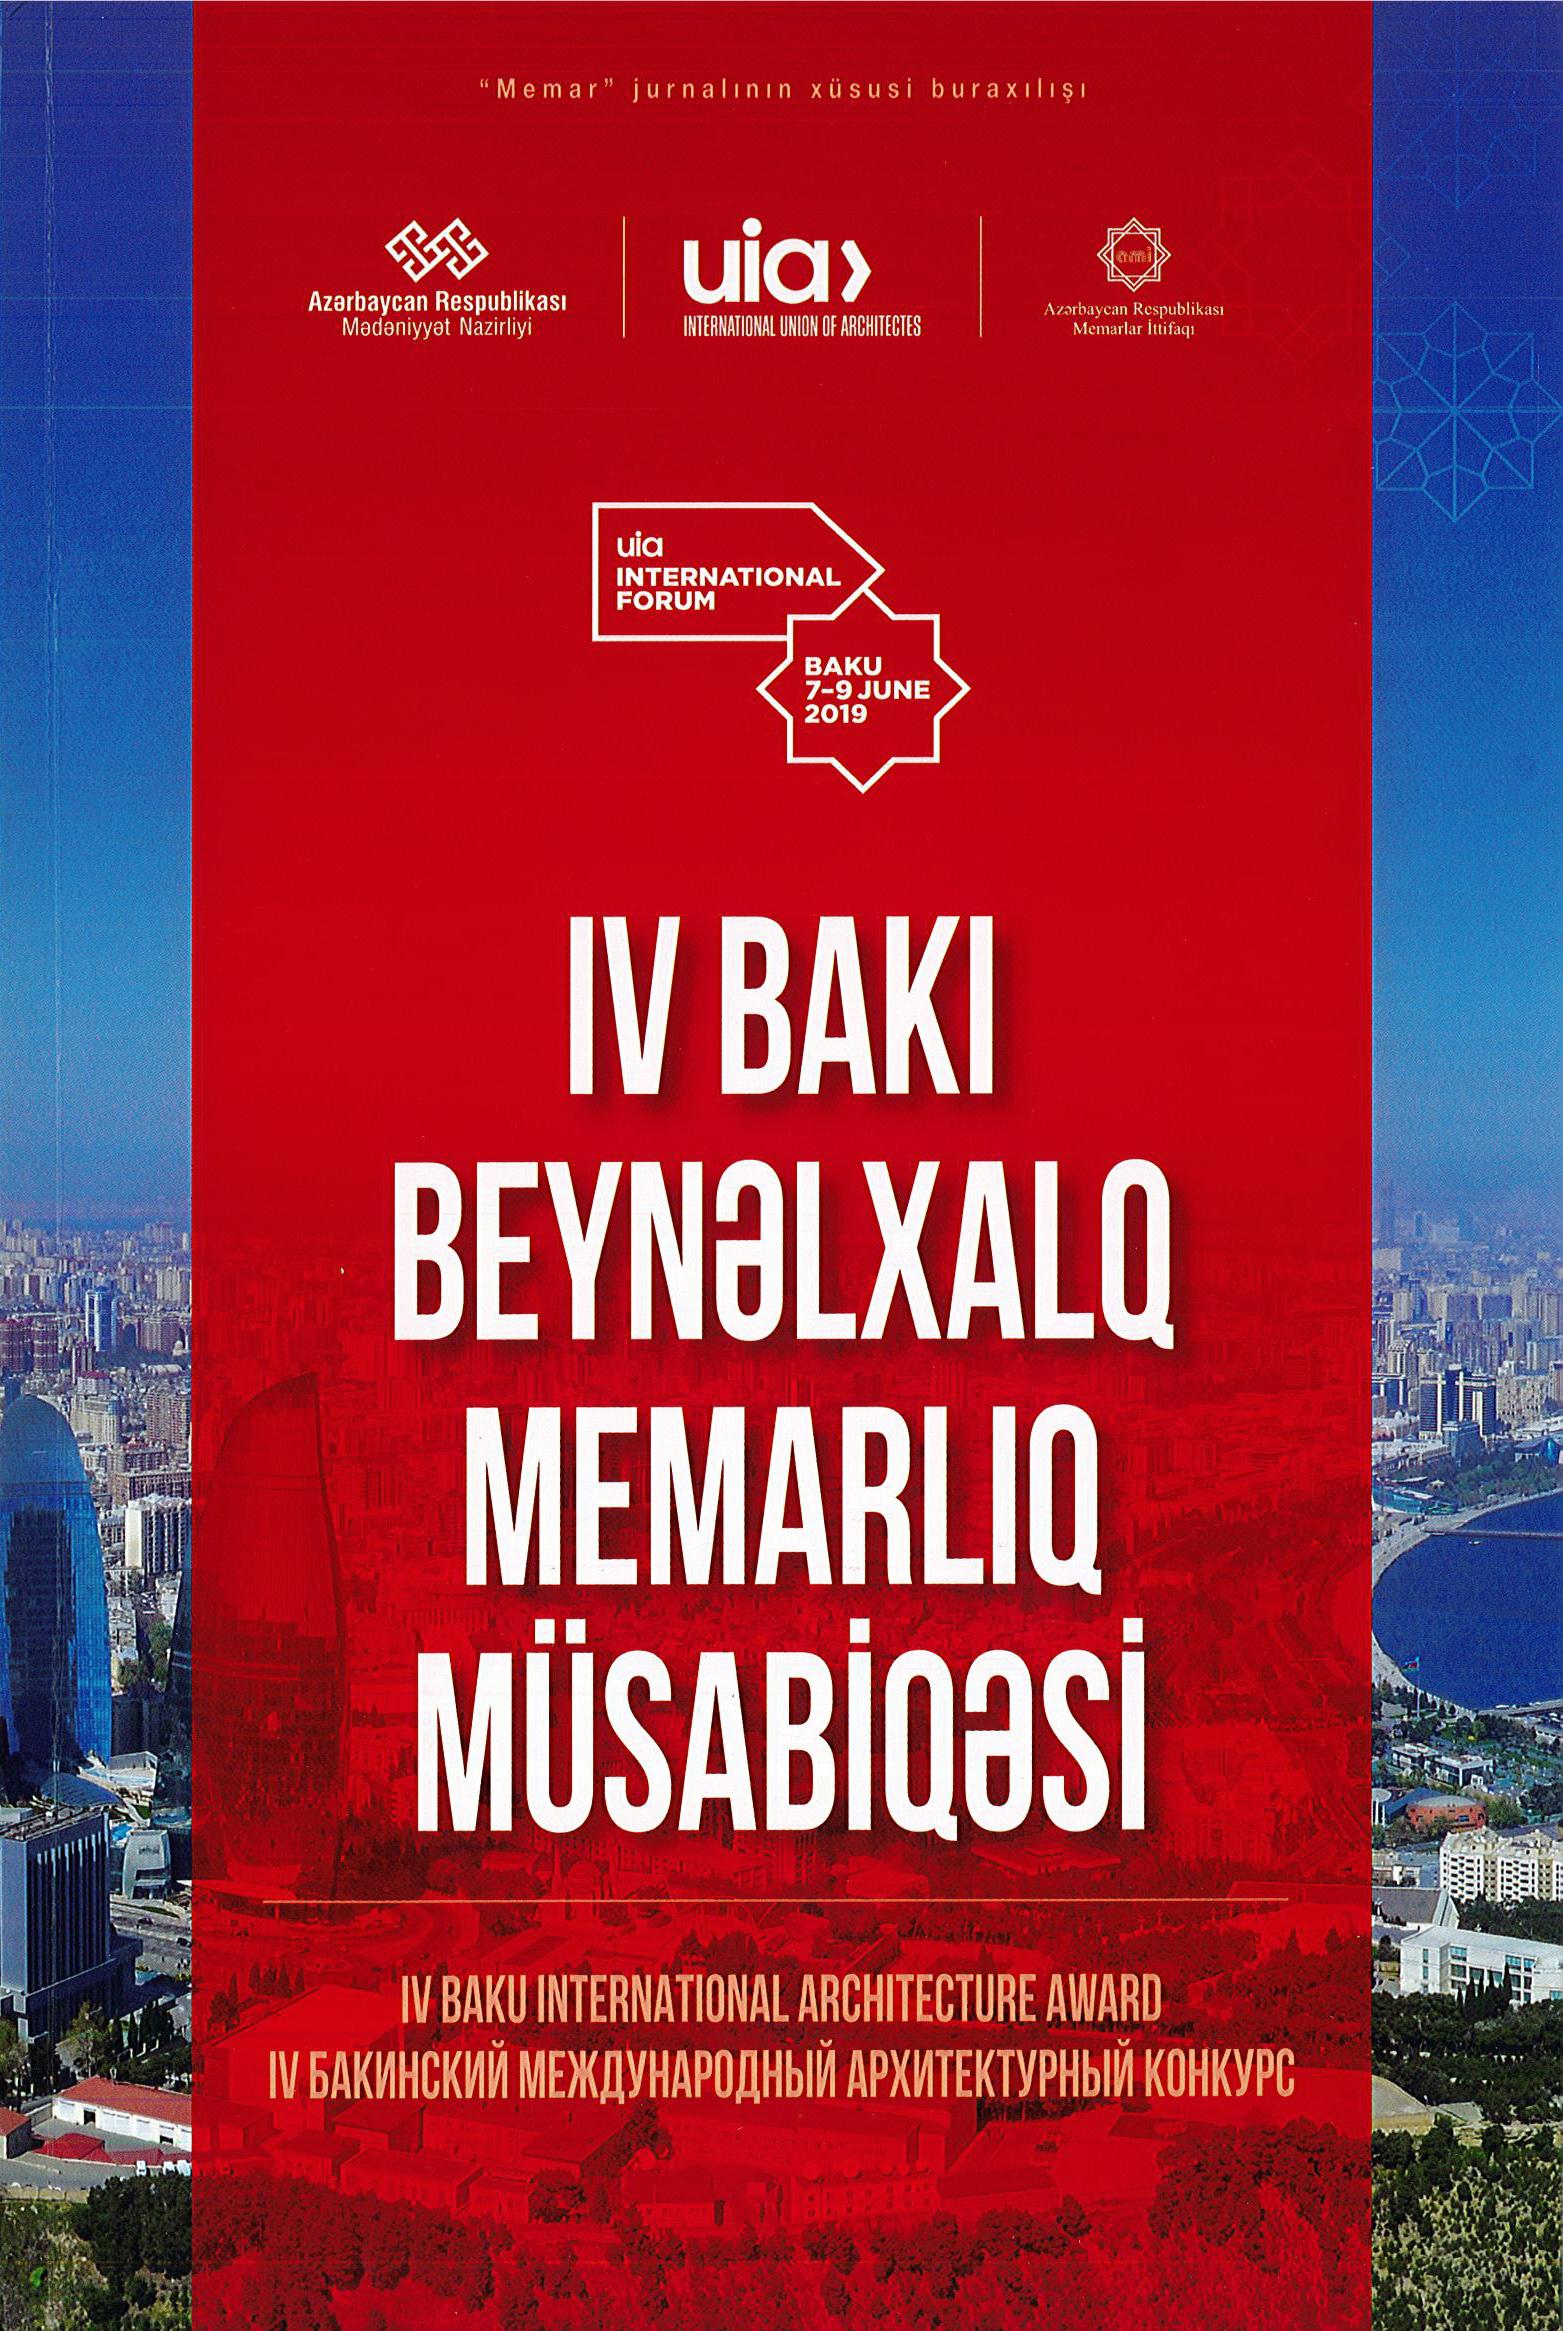 Baku Award